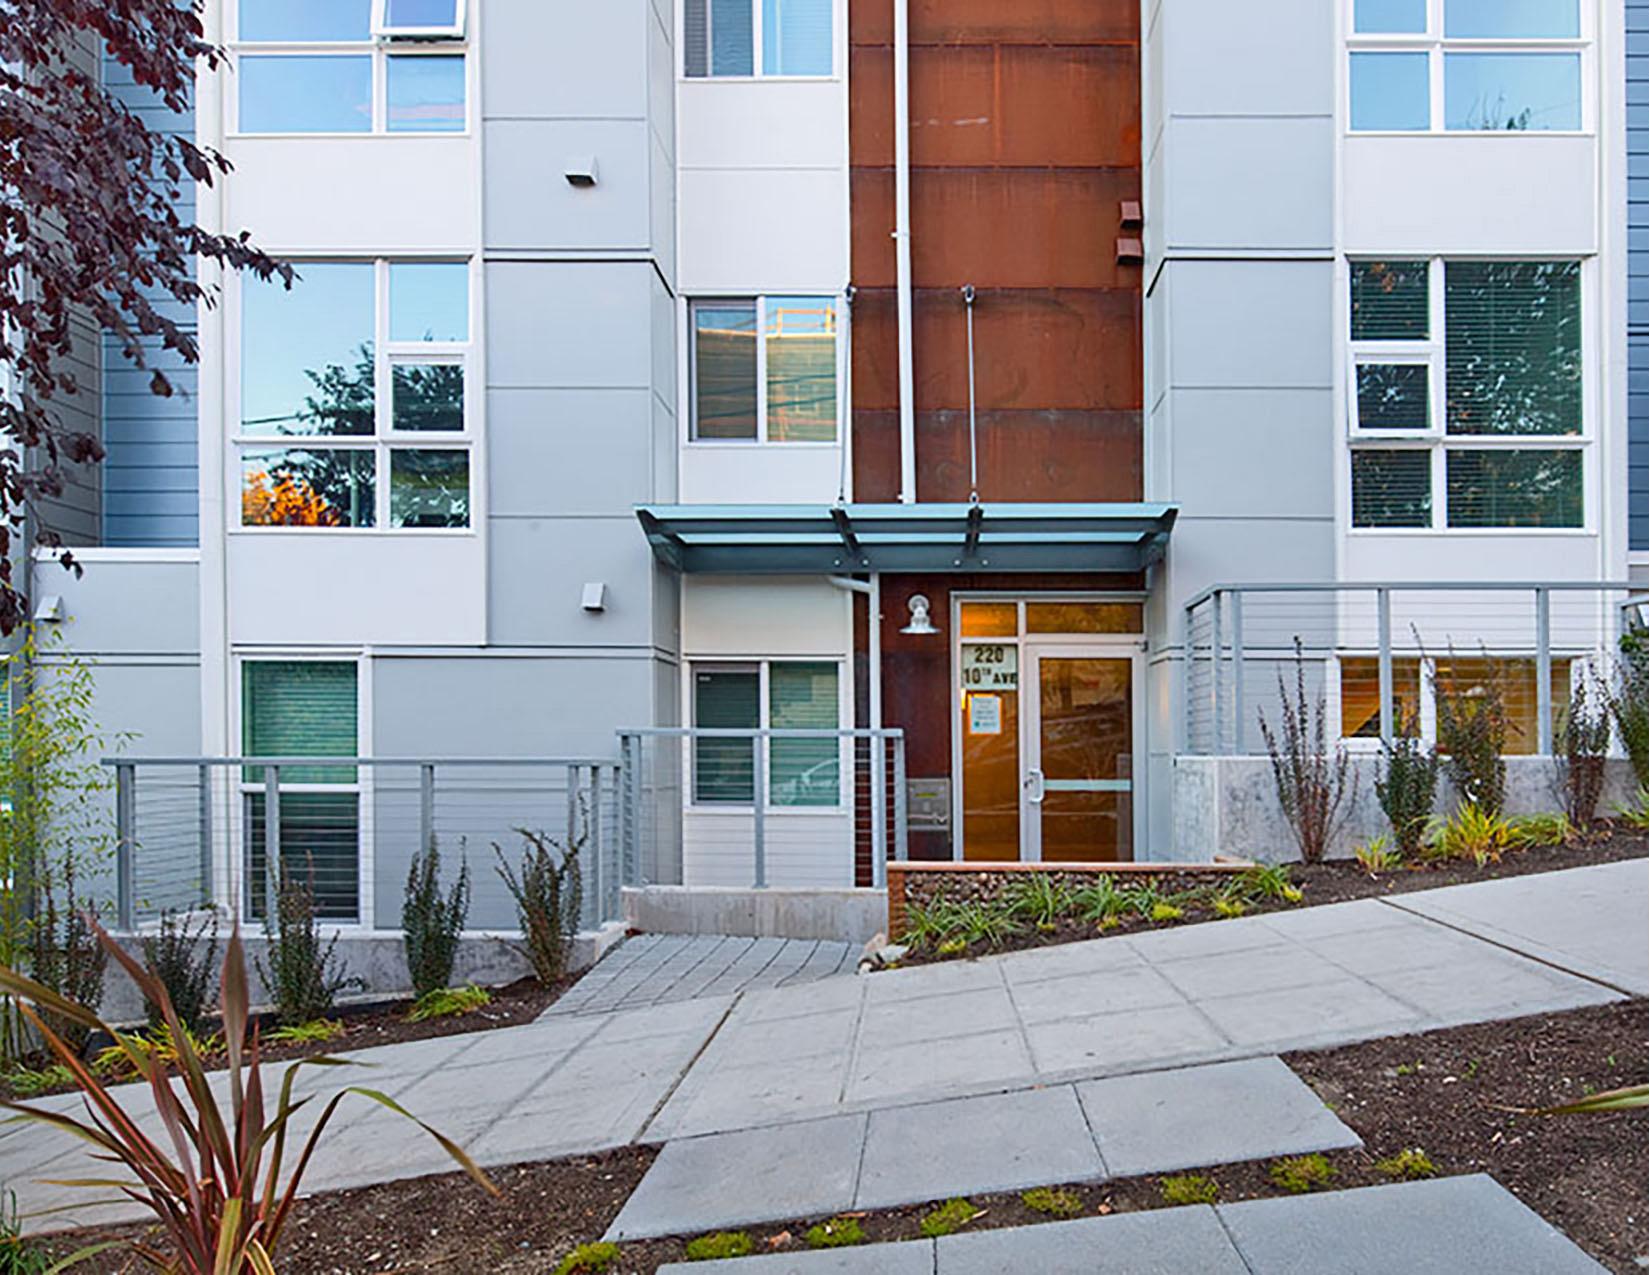 ALDER FLATS First Hill/Yesler Terrace, Seattle, WA